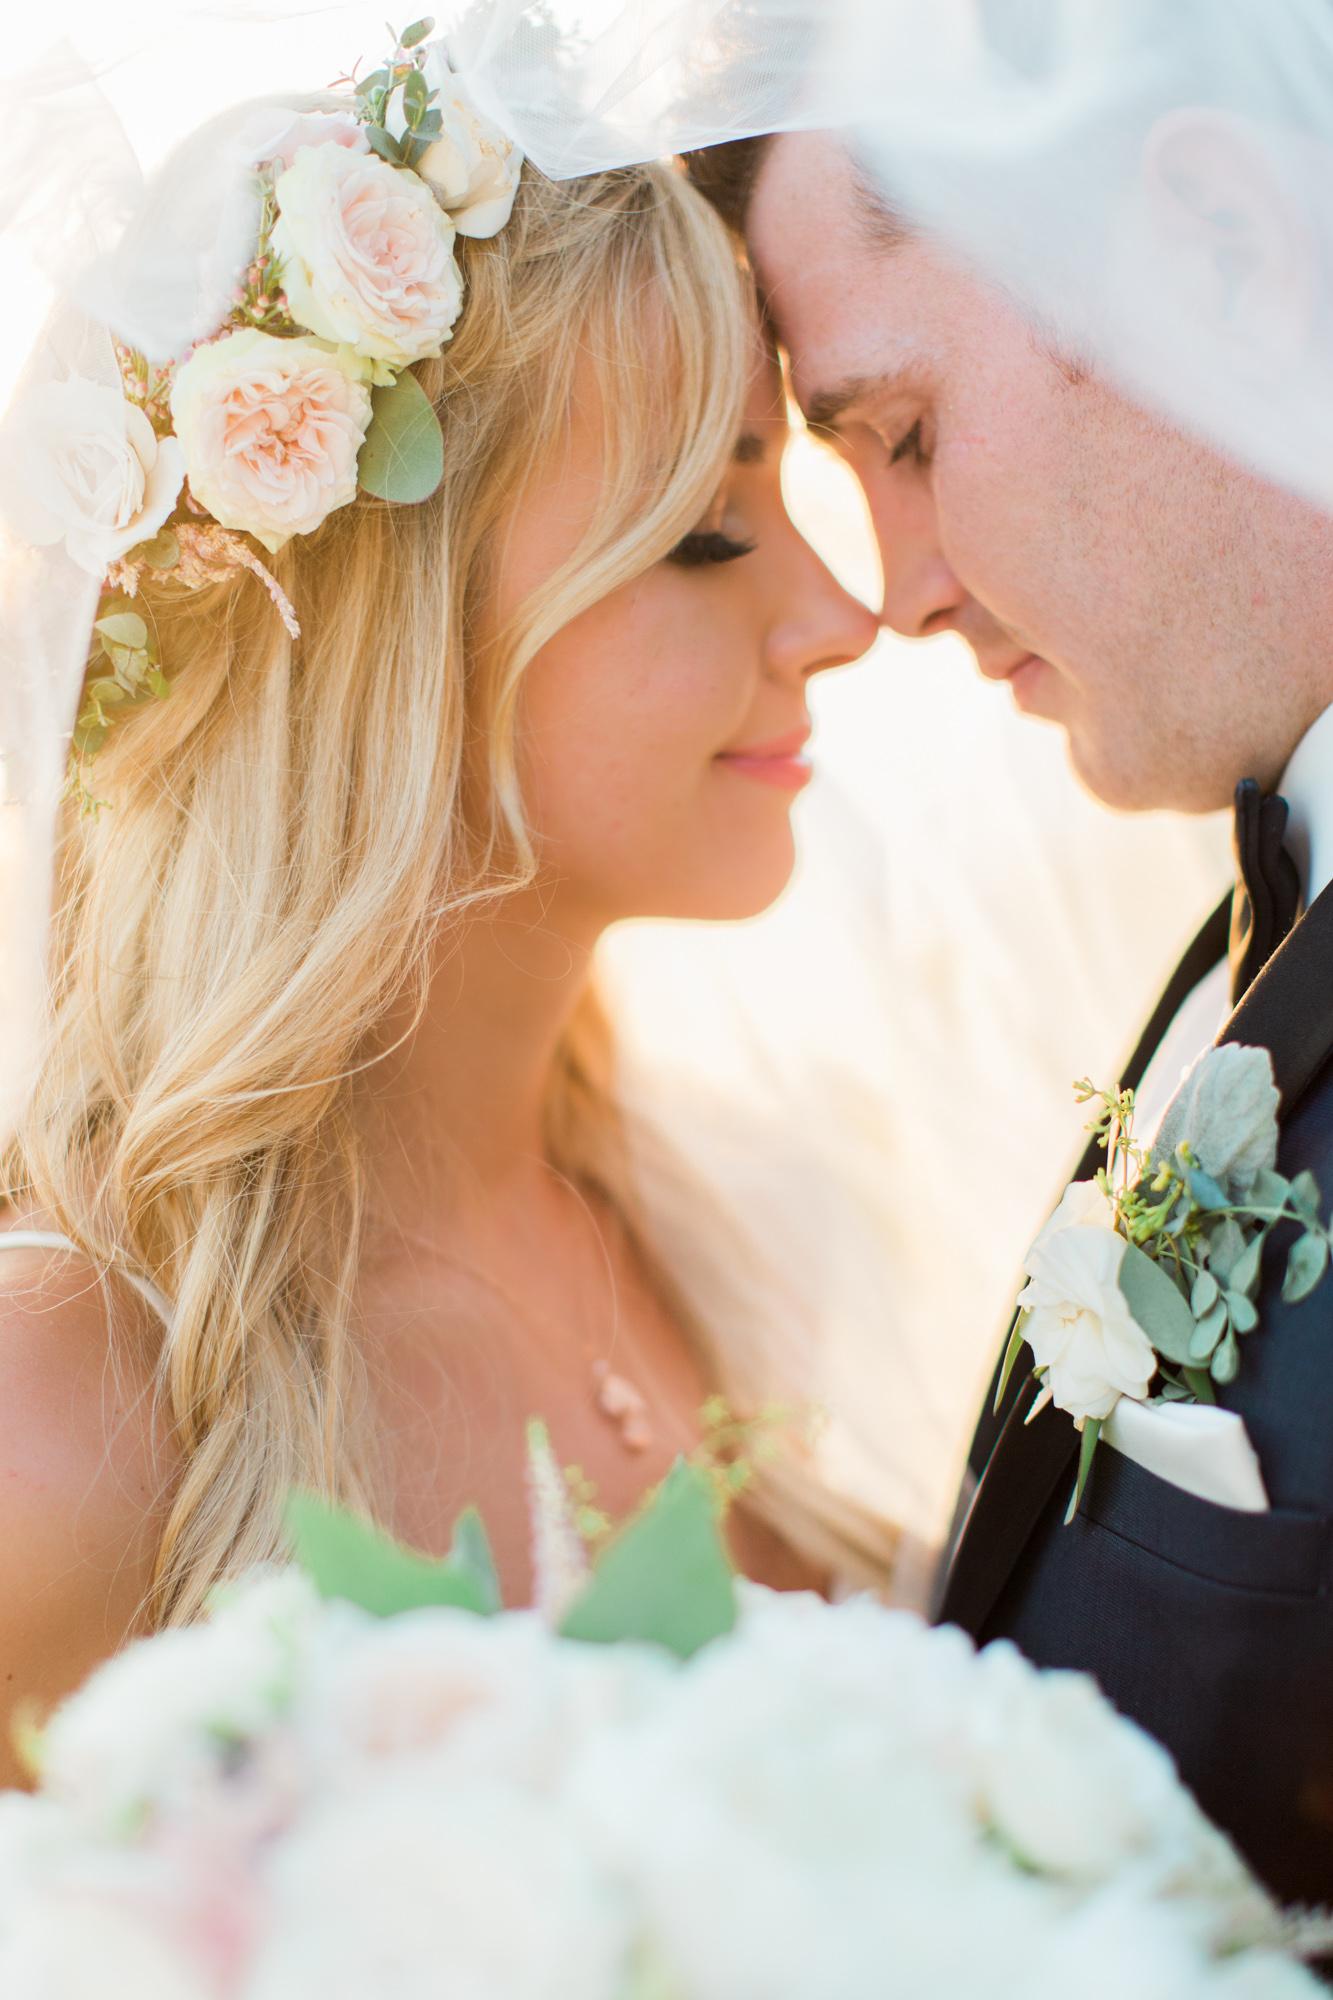 Orange_County_Laguna_Beach_Bride_Groom_Wedding_Hair_Makeup_11.jpg